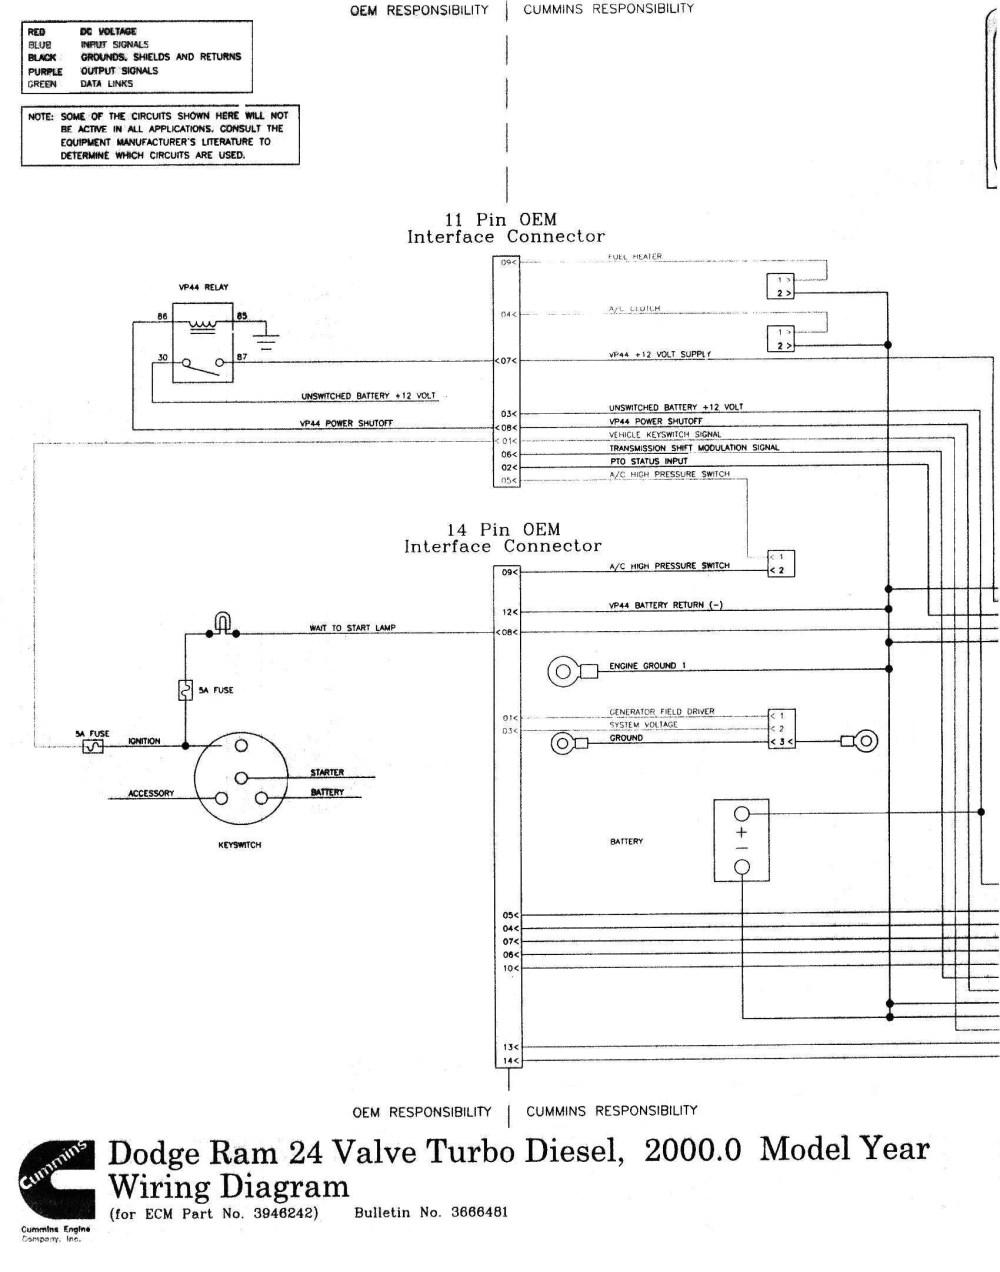 medium resolution of ram 2500 wiring diagram electrical schematic wiring diagram 2002 dodge ram 2500 wiring diagram fuel pump 2002 dodge ram 2500 wiring diagram